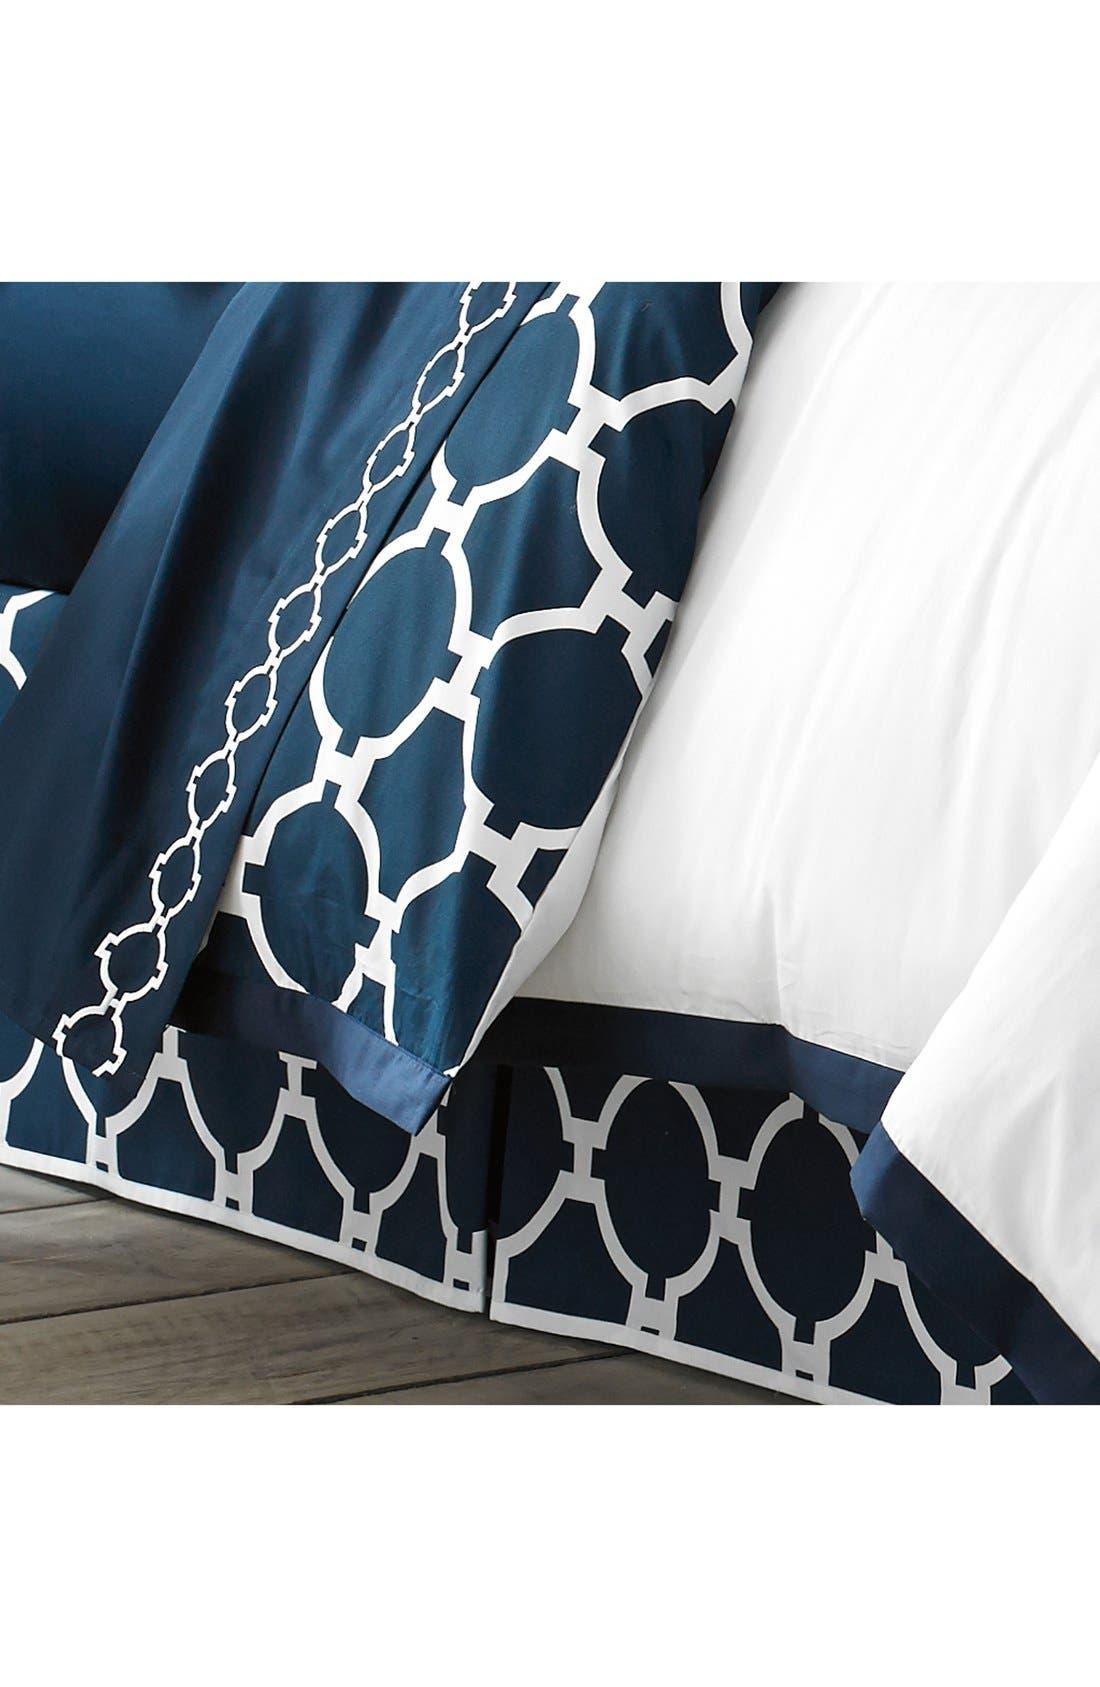 Main Image - Jill Rosenwald 'Copley Hampton Links' Bed Skirt